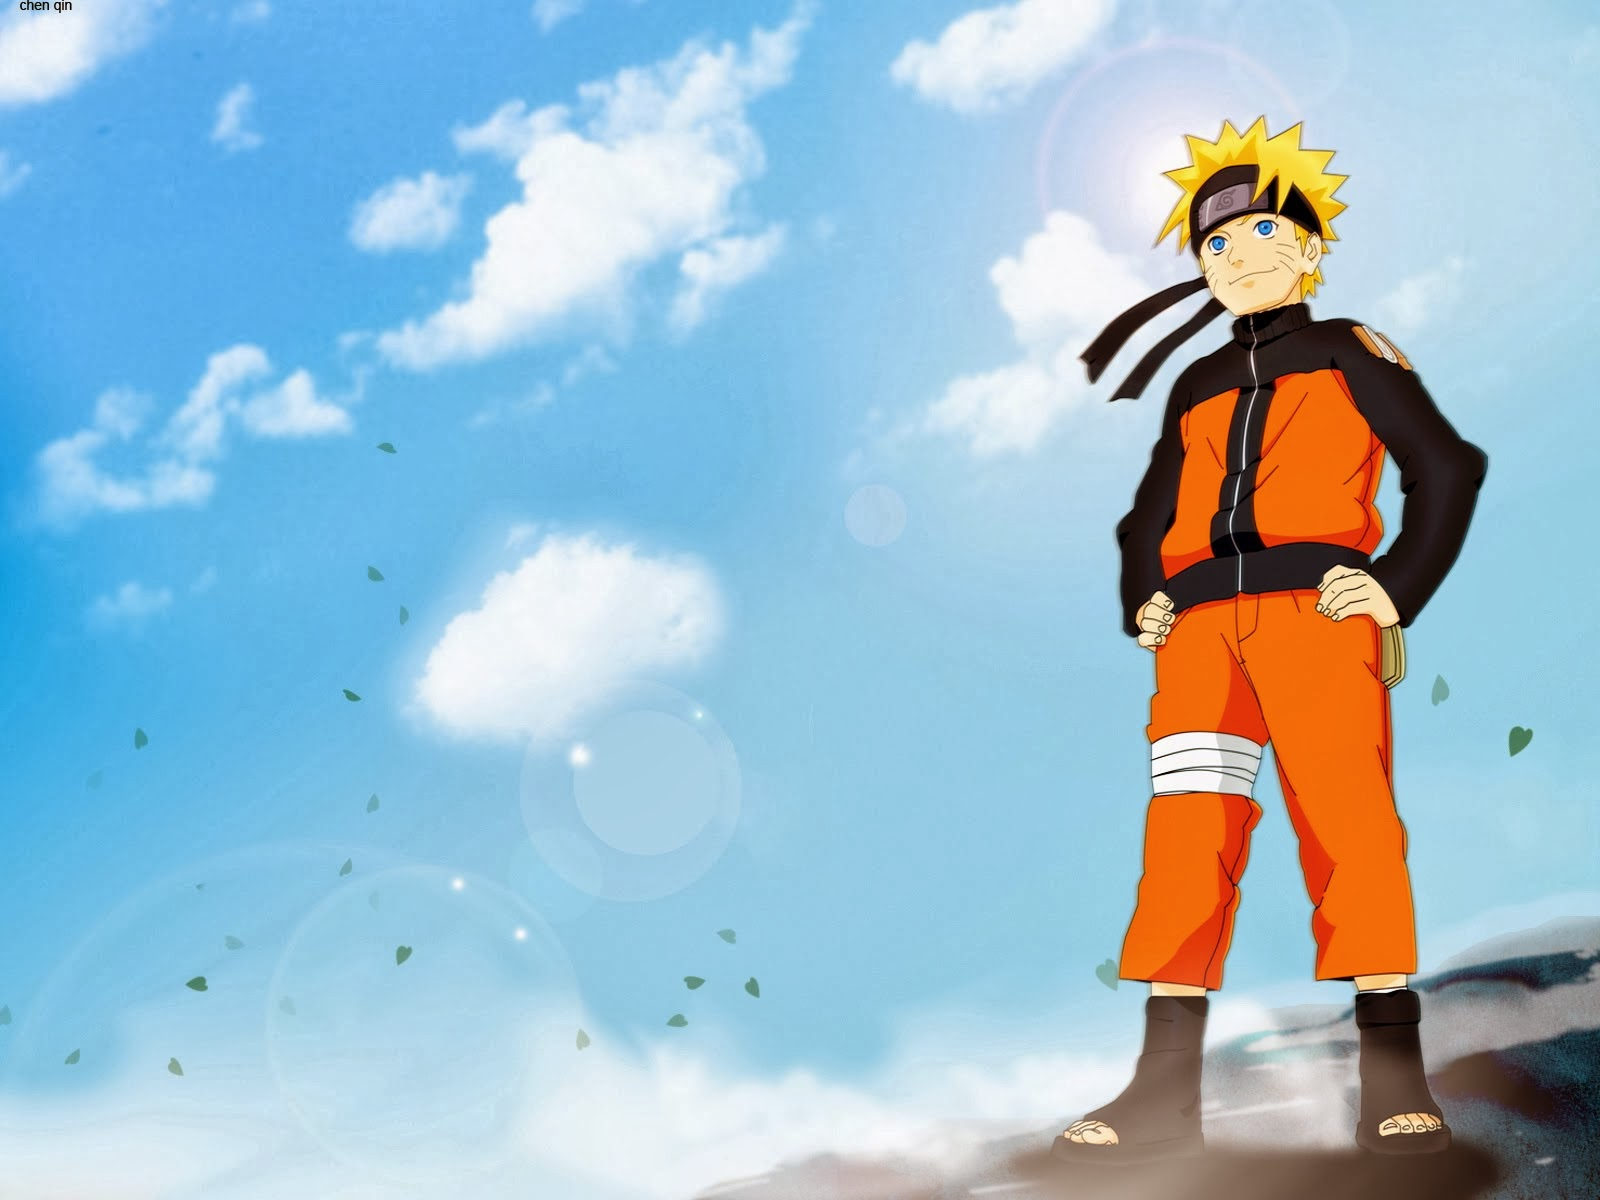 Almu Tasim Koleksi Gambar Naruto Image Source Google Images Foto